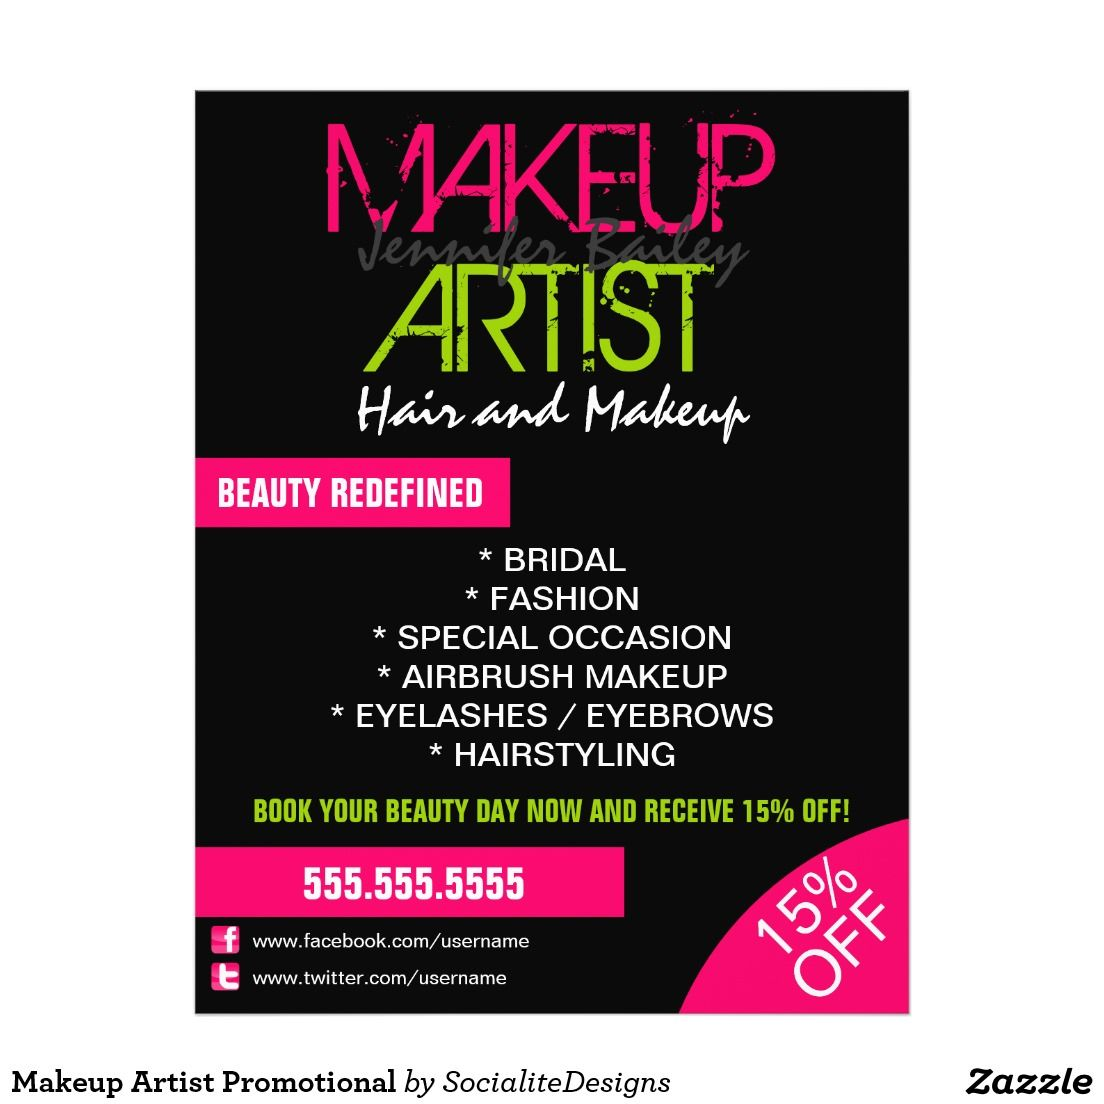 Makeup Artist Promotional Flyer Zazzle Com In 2021 Makeup Artist Beauty Salon Posters Professional Makeup Artist Kit